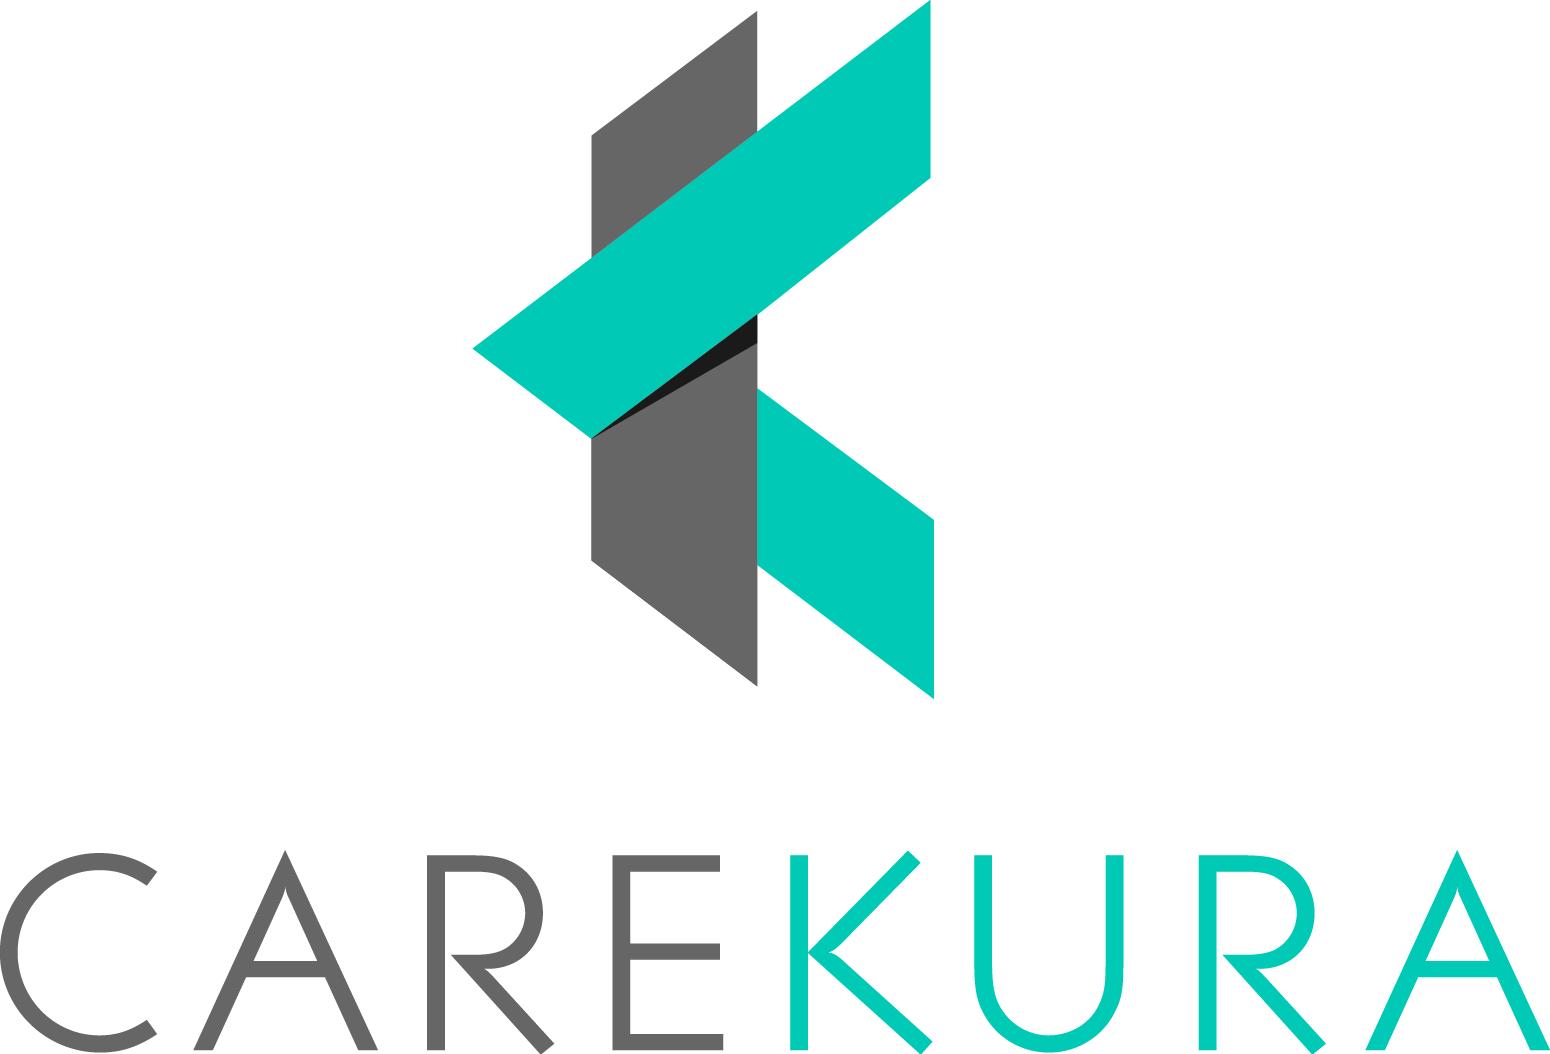 ck_logo_cmyk.jpg